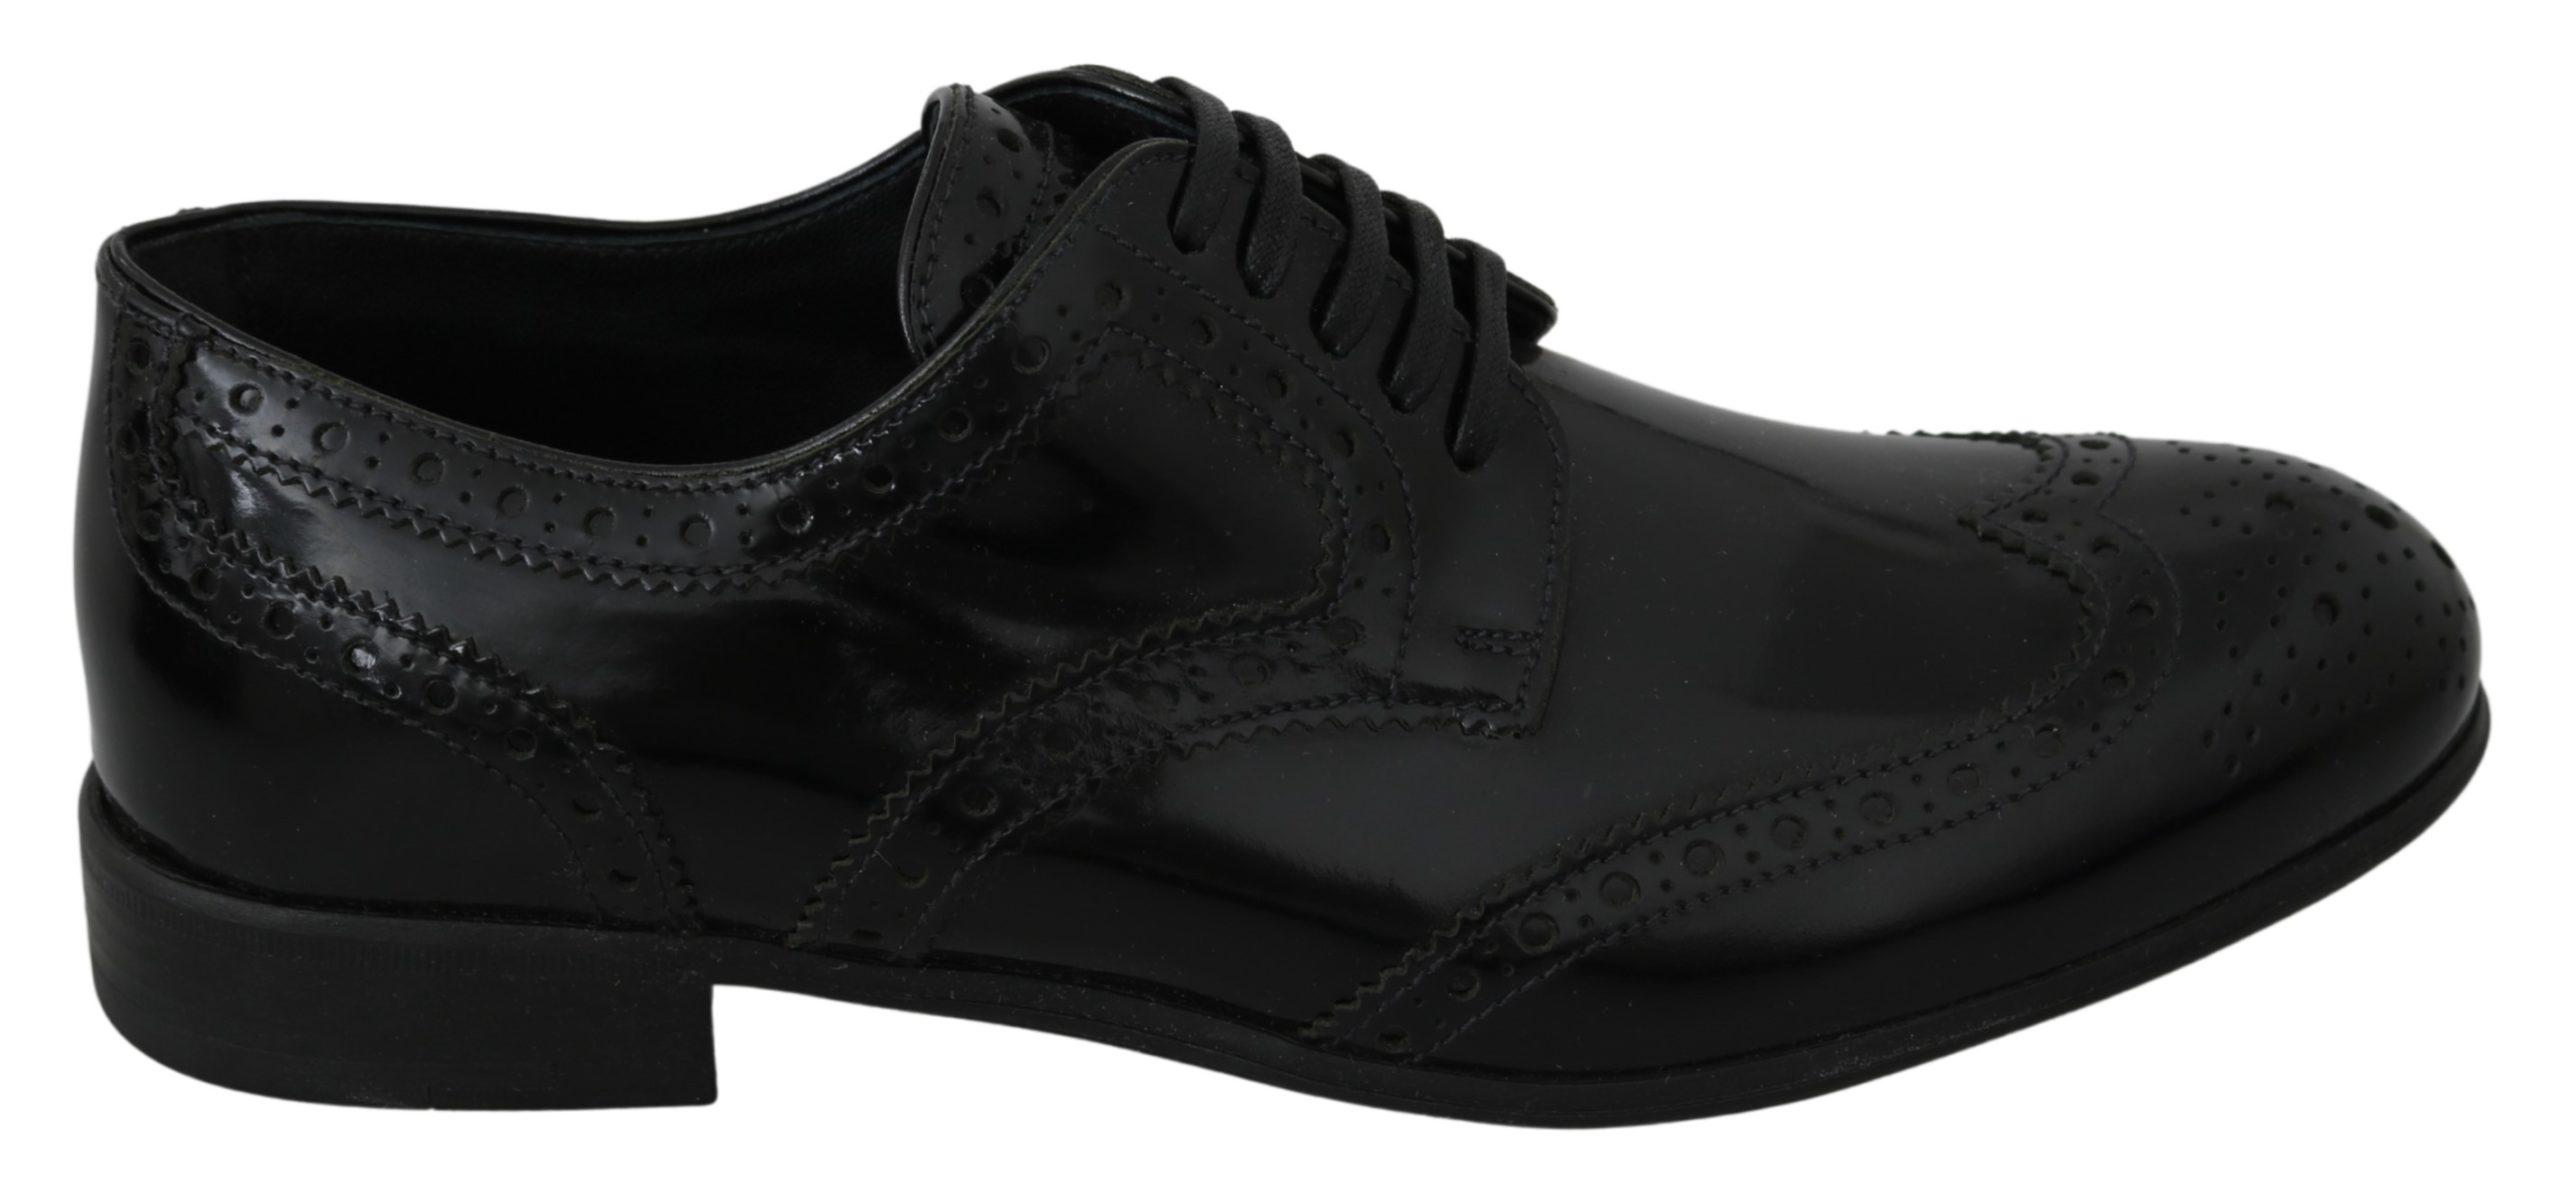 Dolce & Gabbana Women's Leather Formal Brogues Shoe Black LA7074 - EU37/US6.5